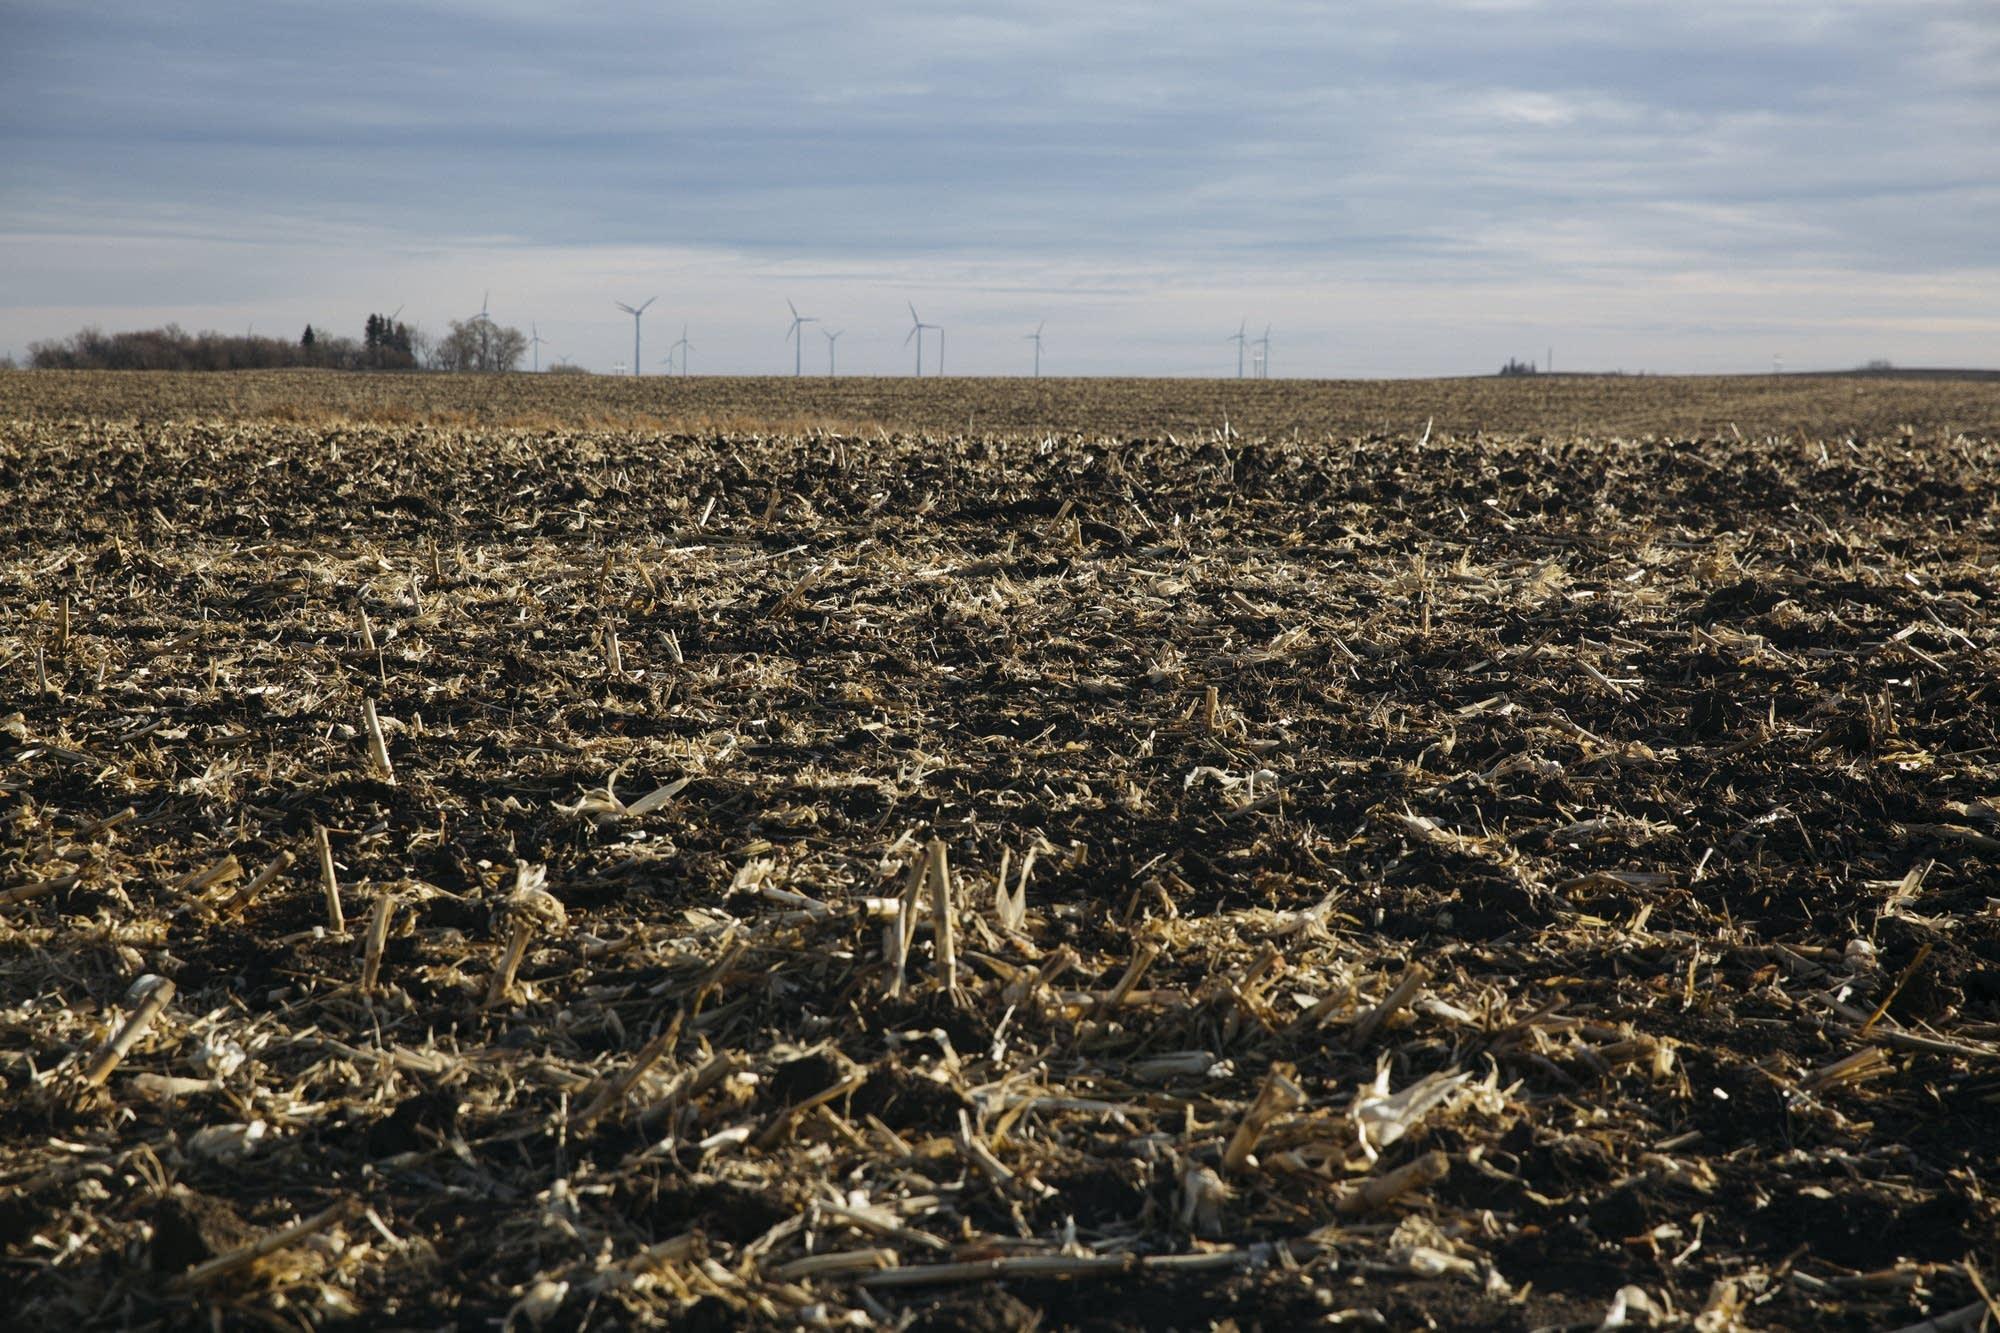 Wind turbines spin over harvested corn fields in Lake Benton, Minn.